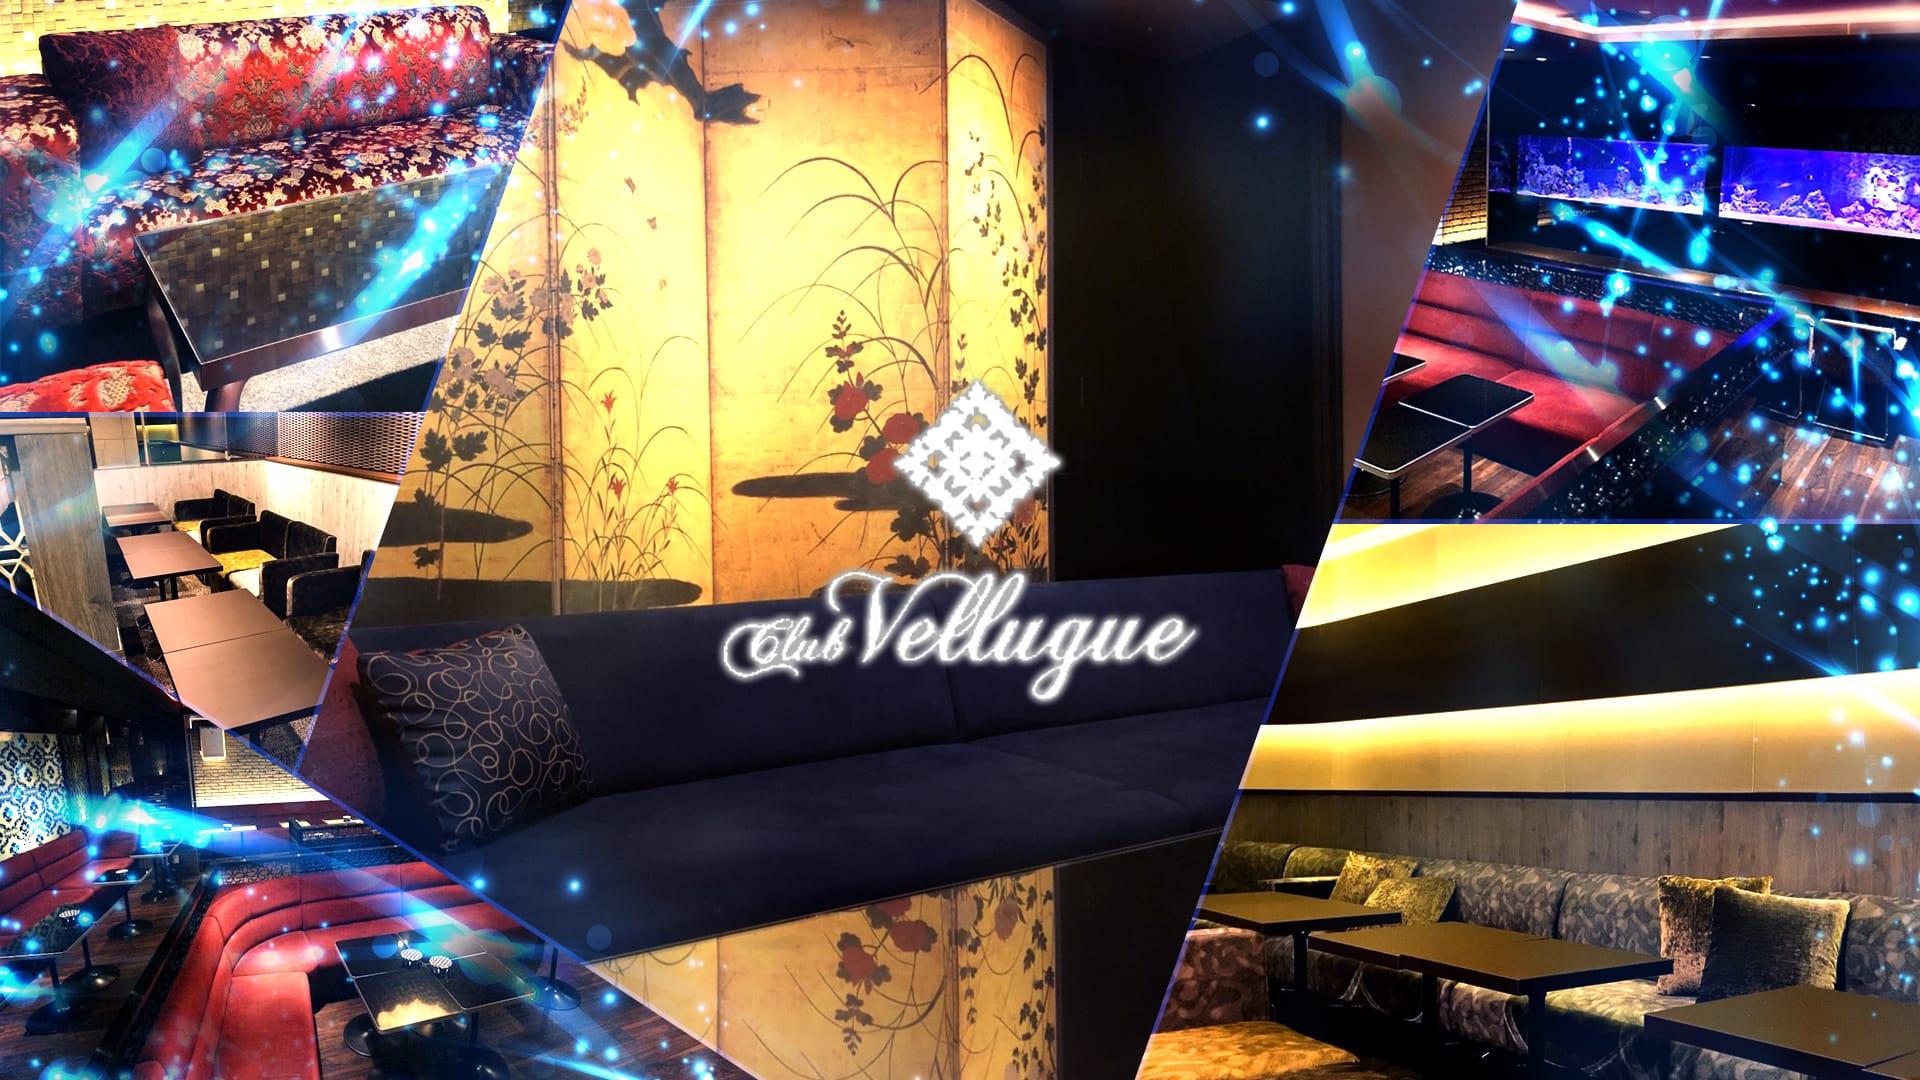 Vellugue(ヴェルージュ) 西船橋キャバクラ TOP画像